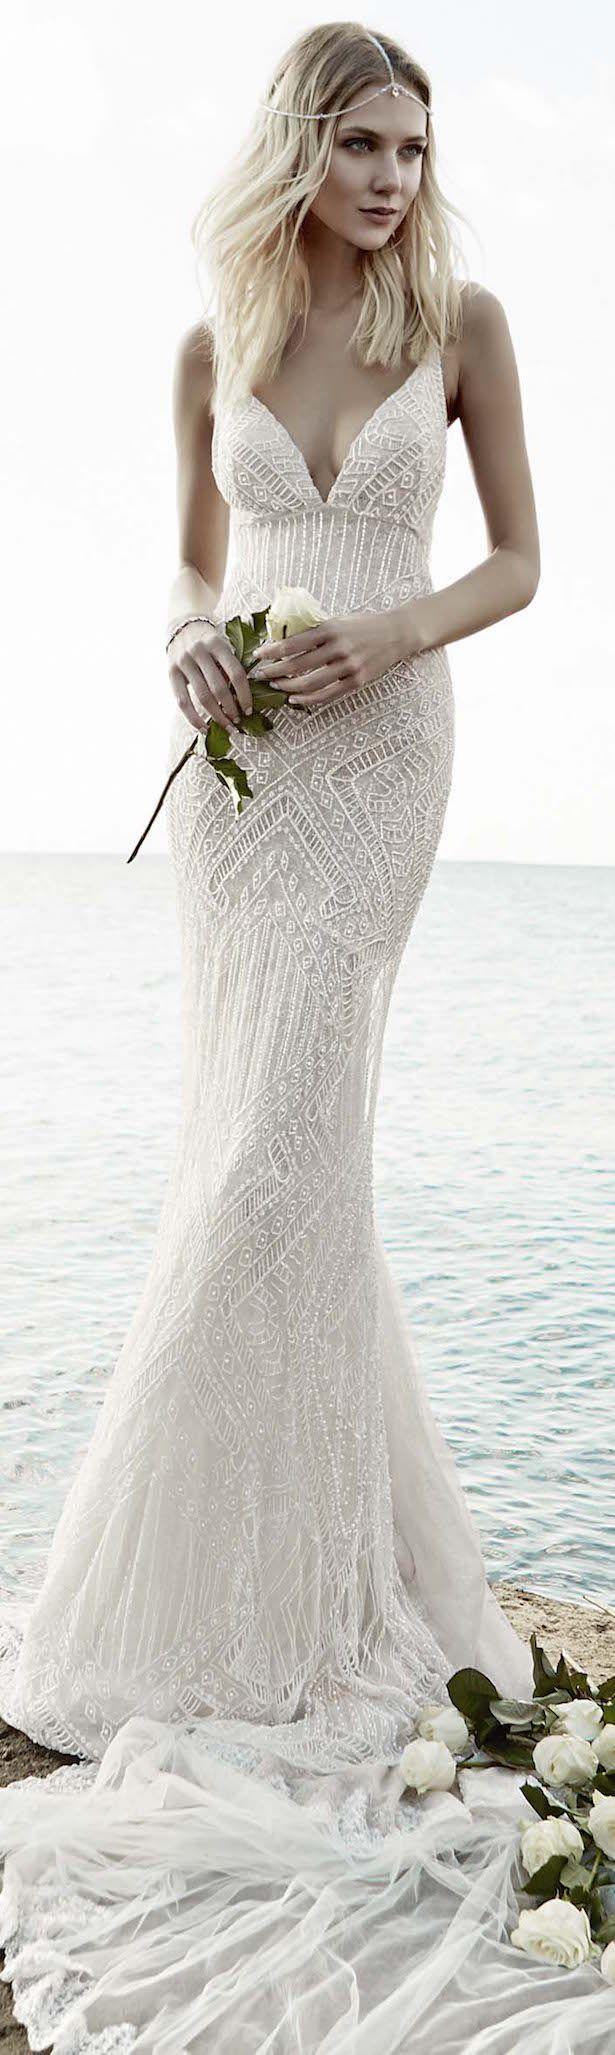 bohemian beach wedding beach dresses for wedding Victoria KyriaKides Bridal Fall Floral Constellations Vintage Lace Wedding DressesBeach